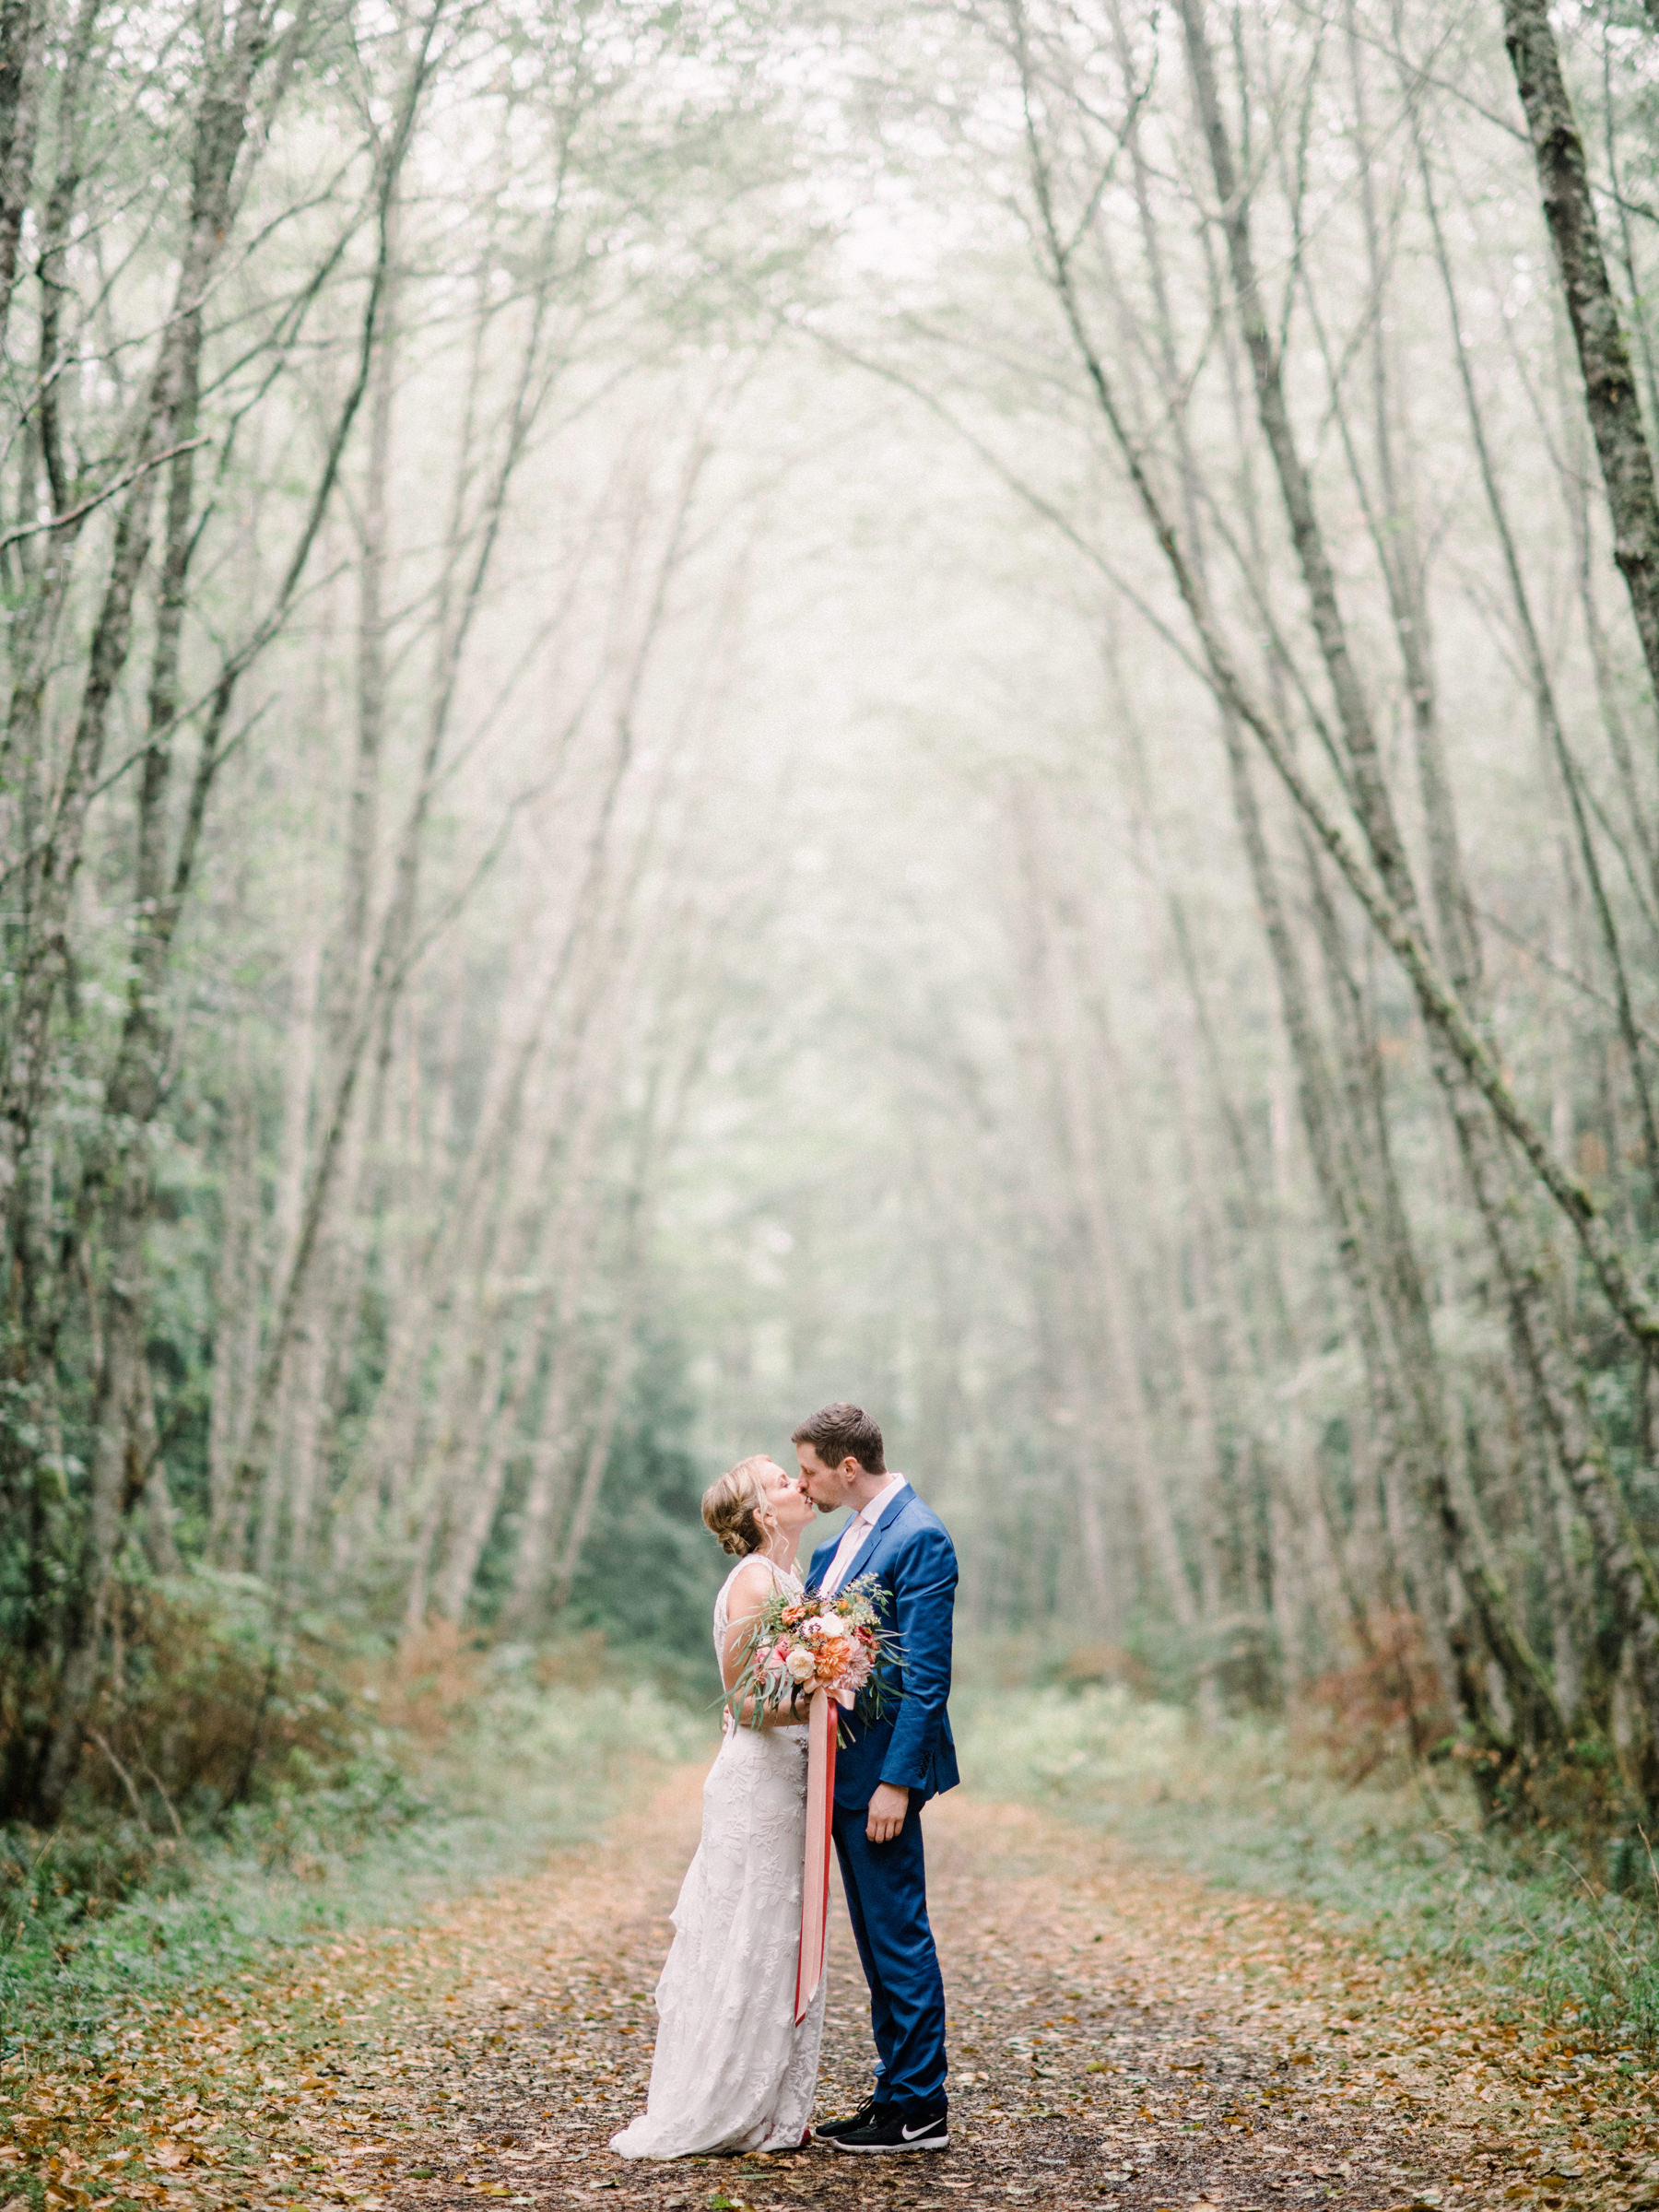 293-colorful-outdoor-lopez-island-wedding.jpg